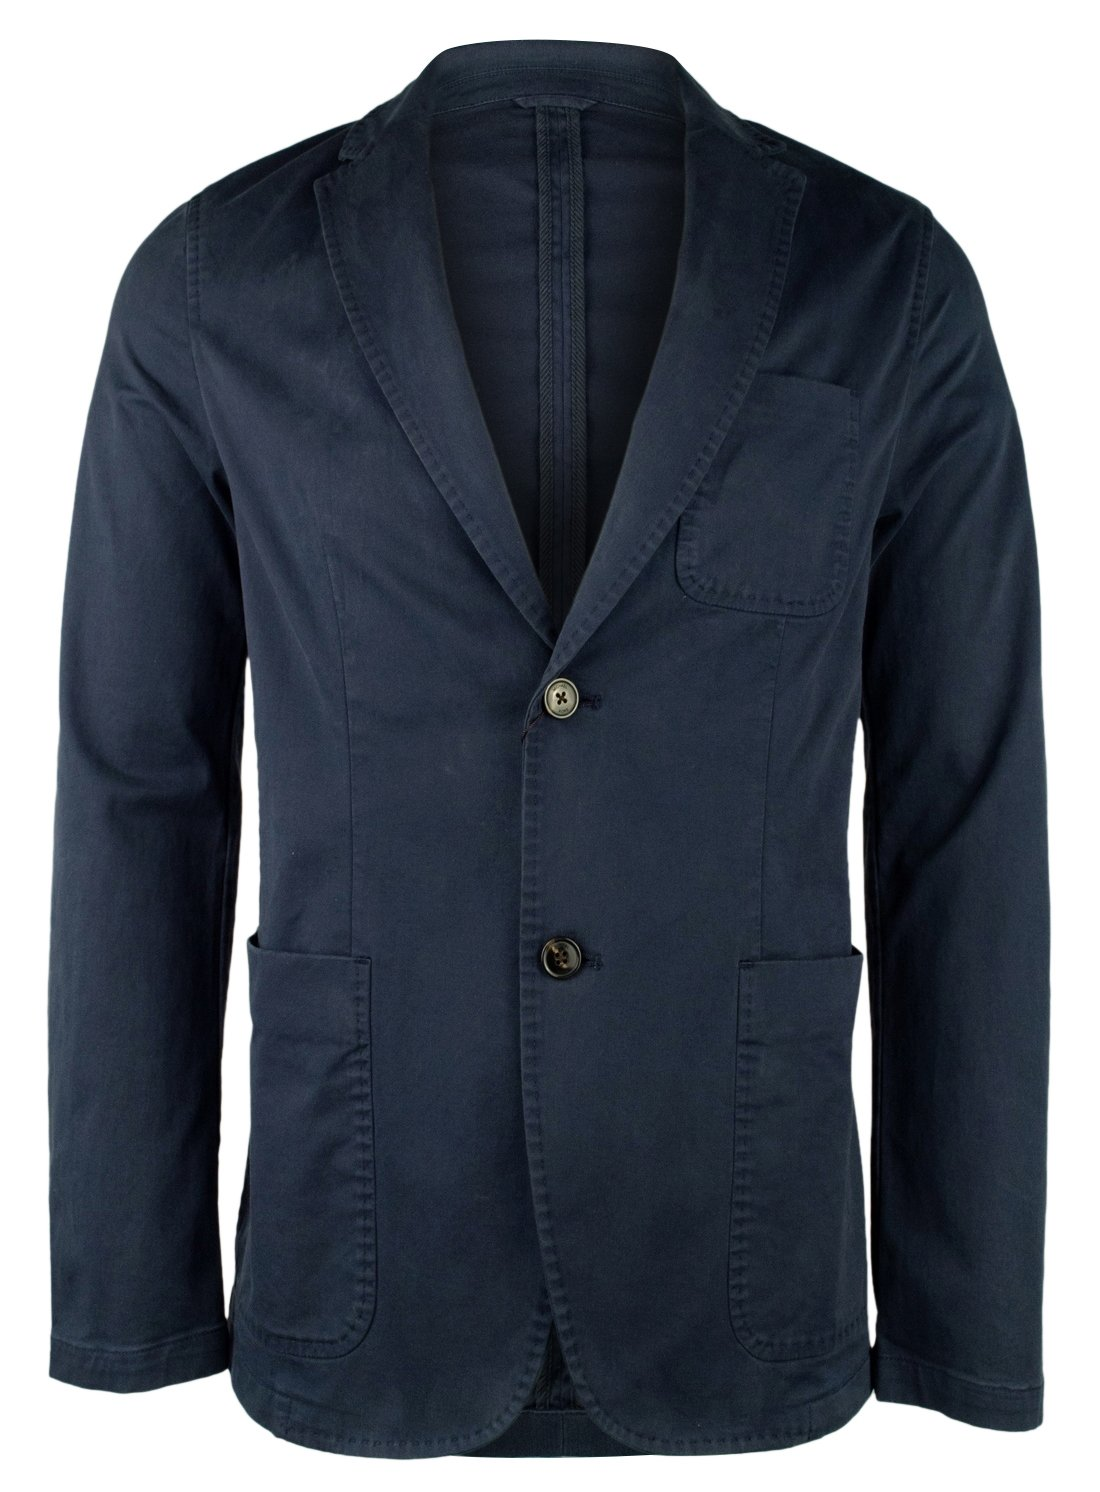 Michael Kors Men's Garment-Dyed Slim Fit Blazer Jacket- M-42R